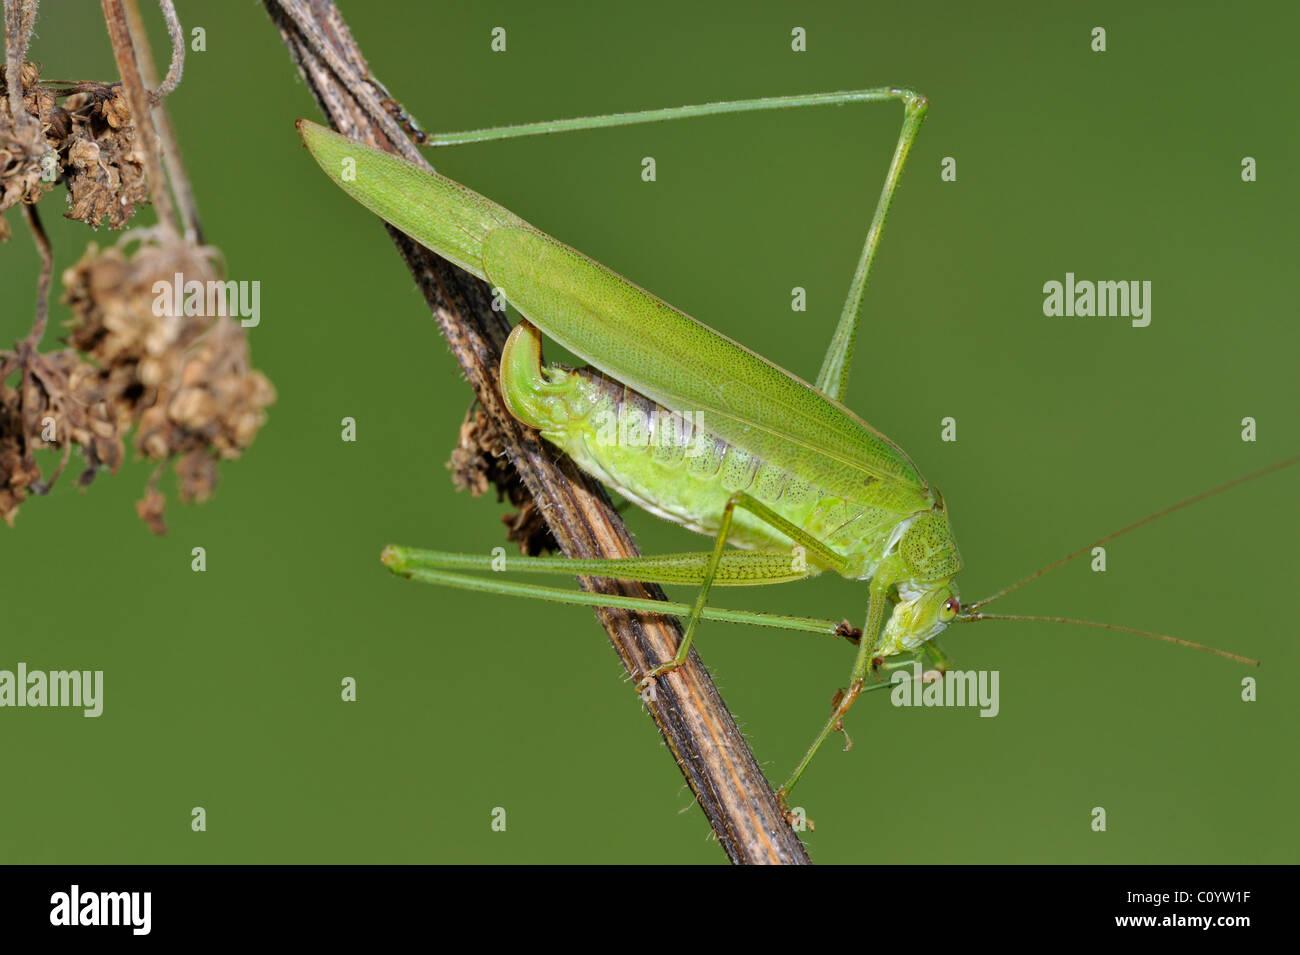 Sickle-bearing Bush-cricket (Phaneroptera falcata) cleaning foot, Belgium - Stock Image